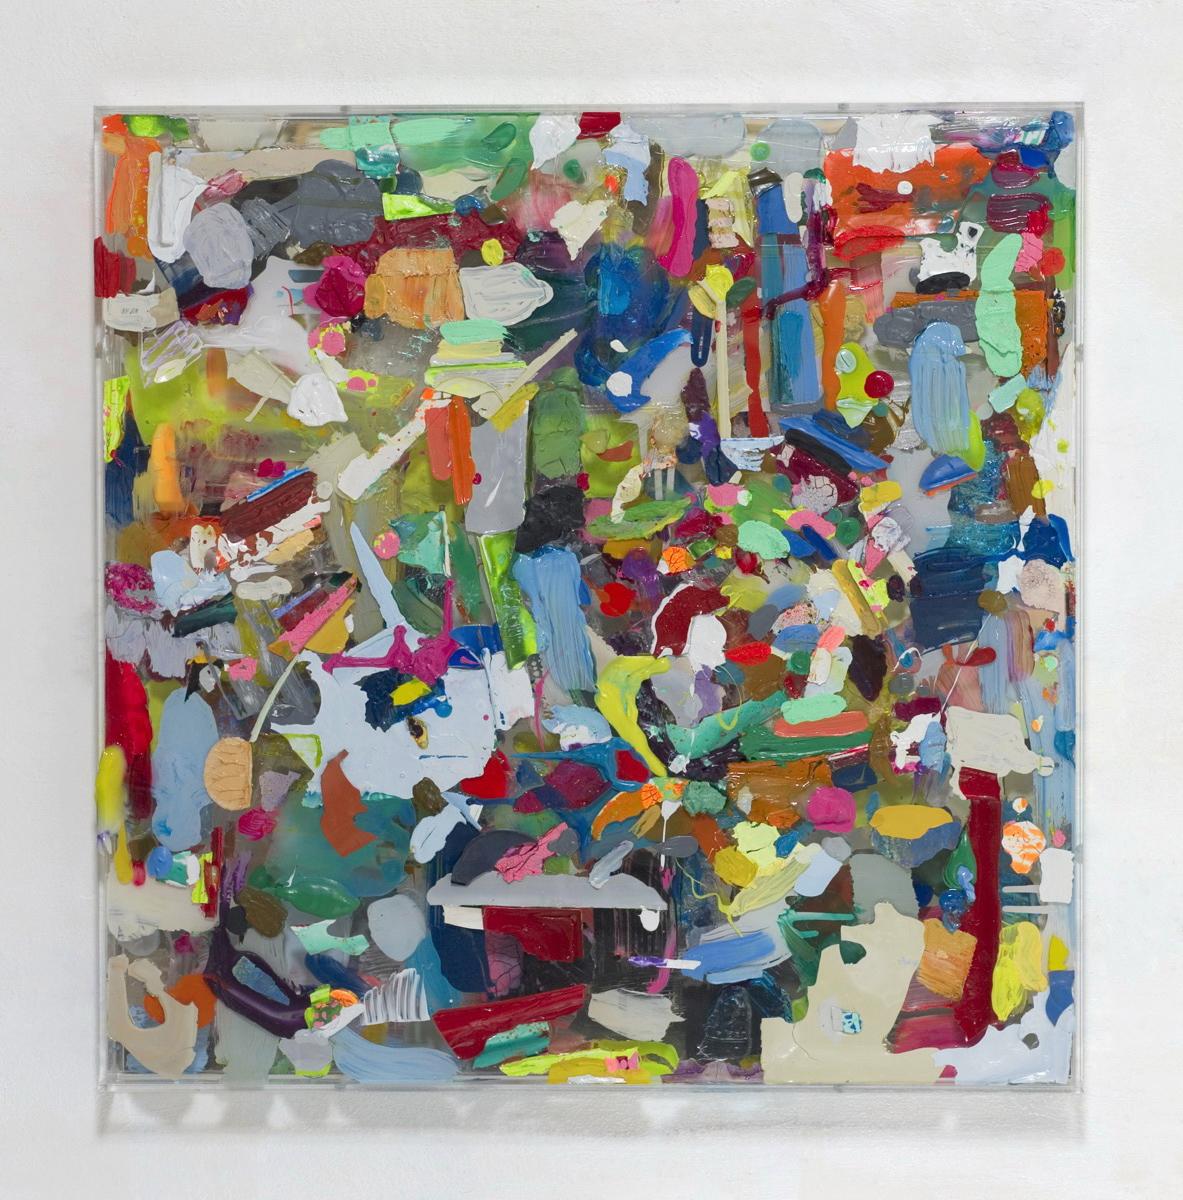 """Farbkasten II"", 61x61x6 cm, Acrylfarbe, Holz, Spiegel, Plexi, 2010"